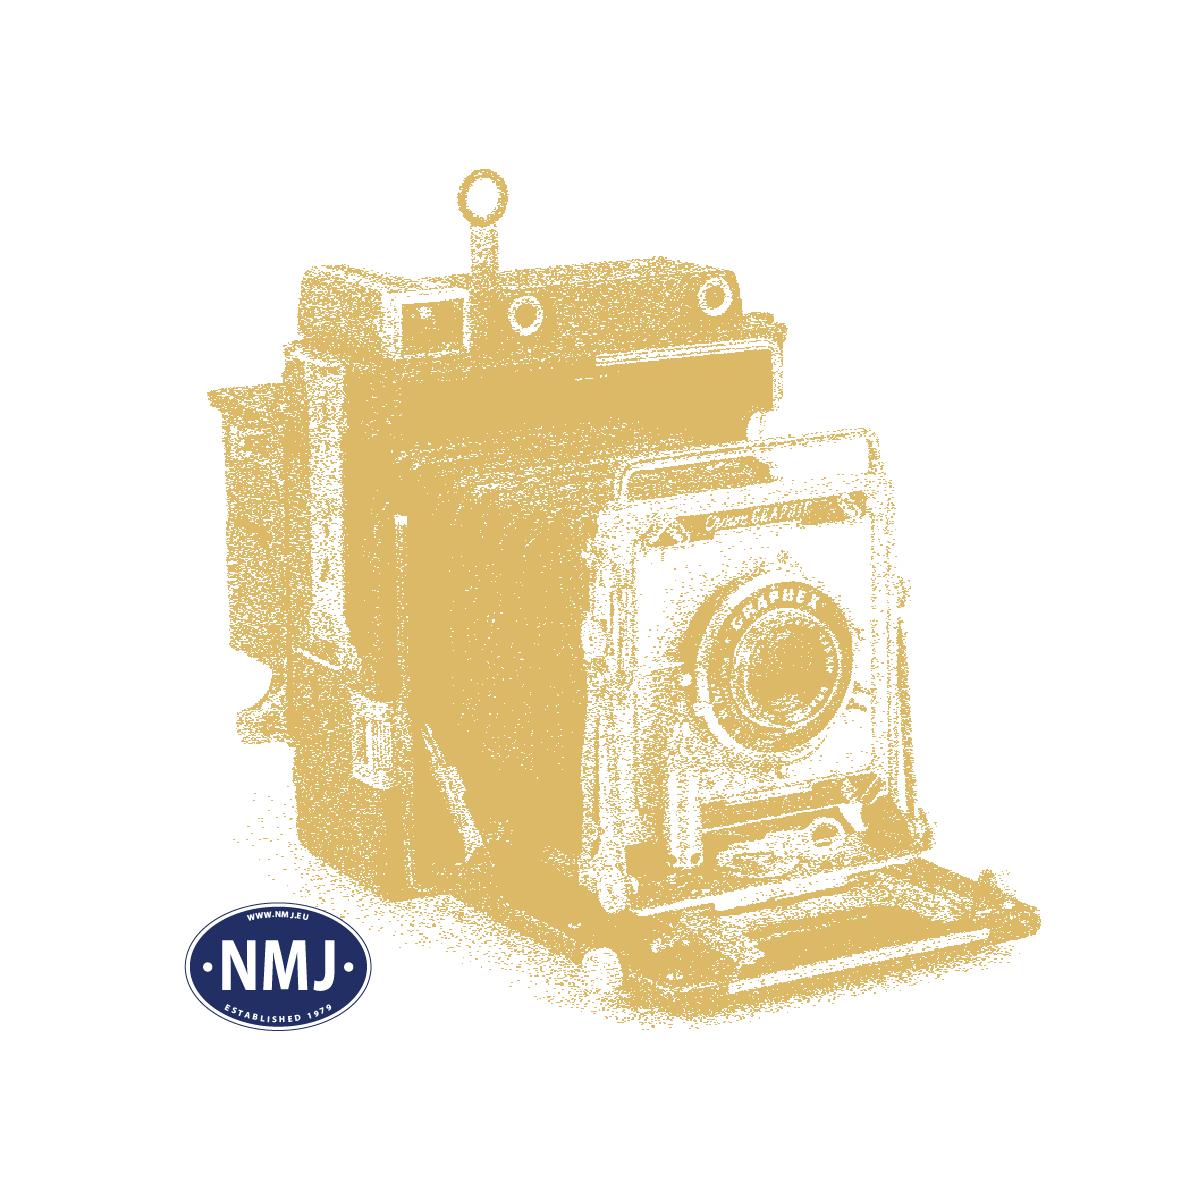 NMJT81.994 - NMJ Topline NSB BM71/73 Radstromabnahmekontakte, 14 Stk.